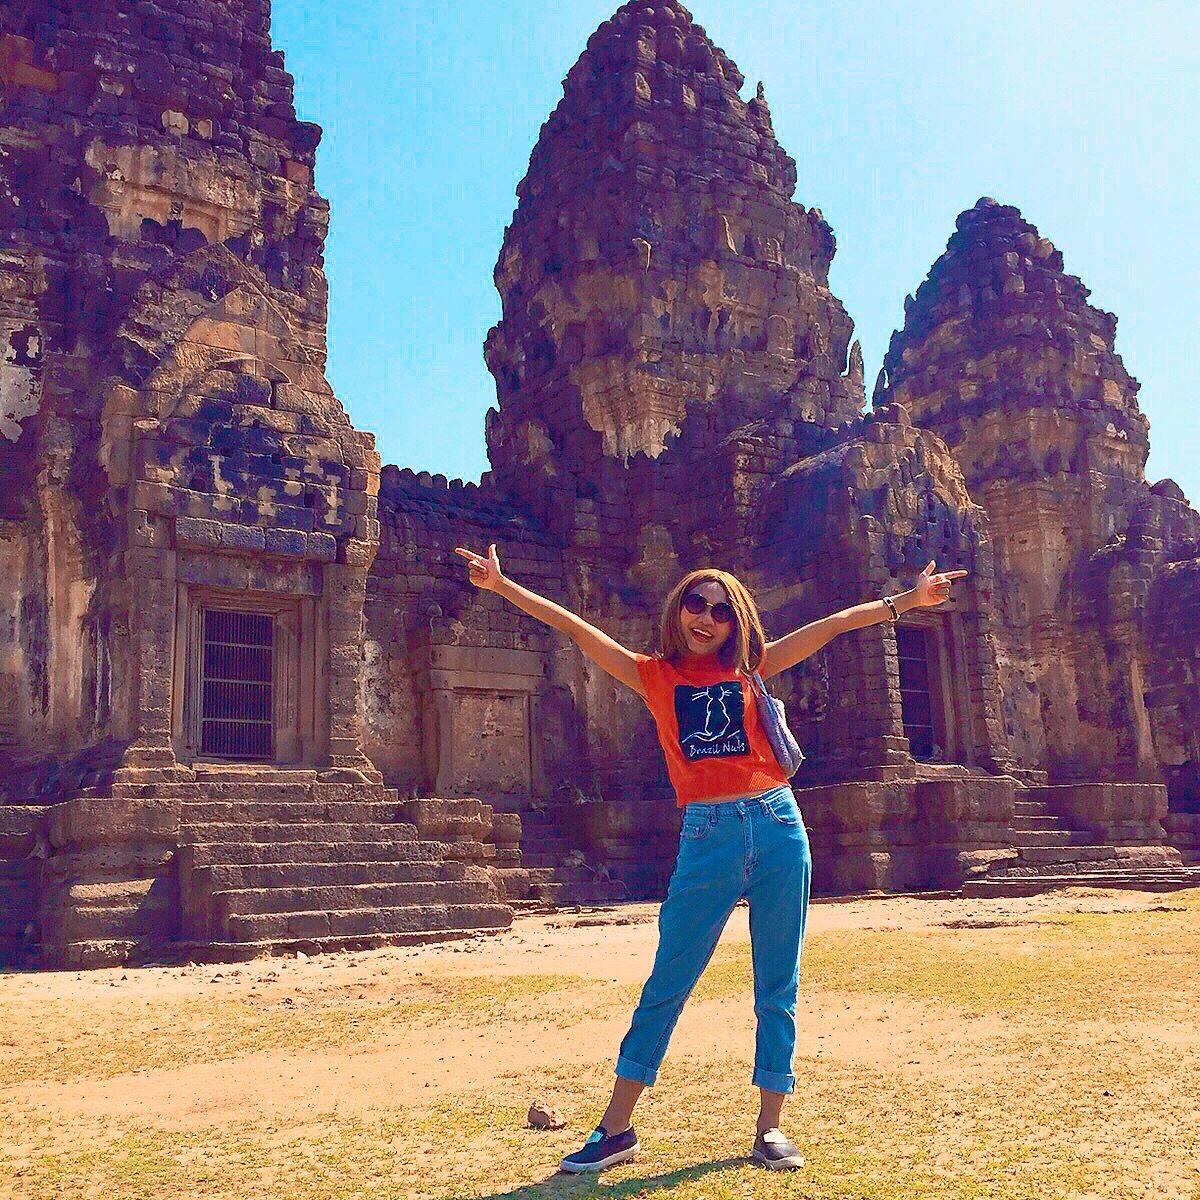 Enjoy Lopburi, the Monkey Town for one day